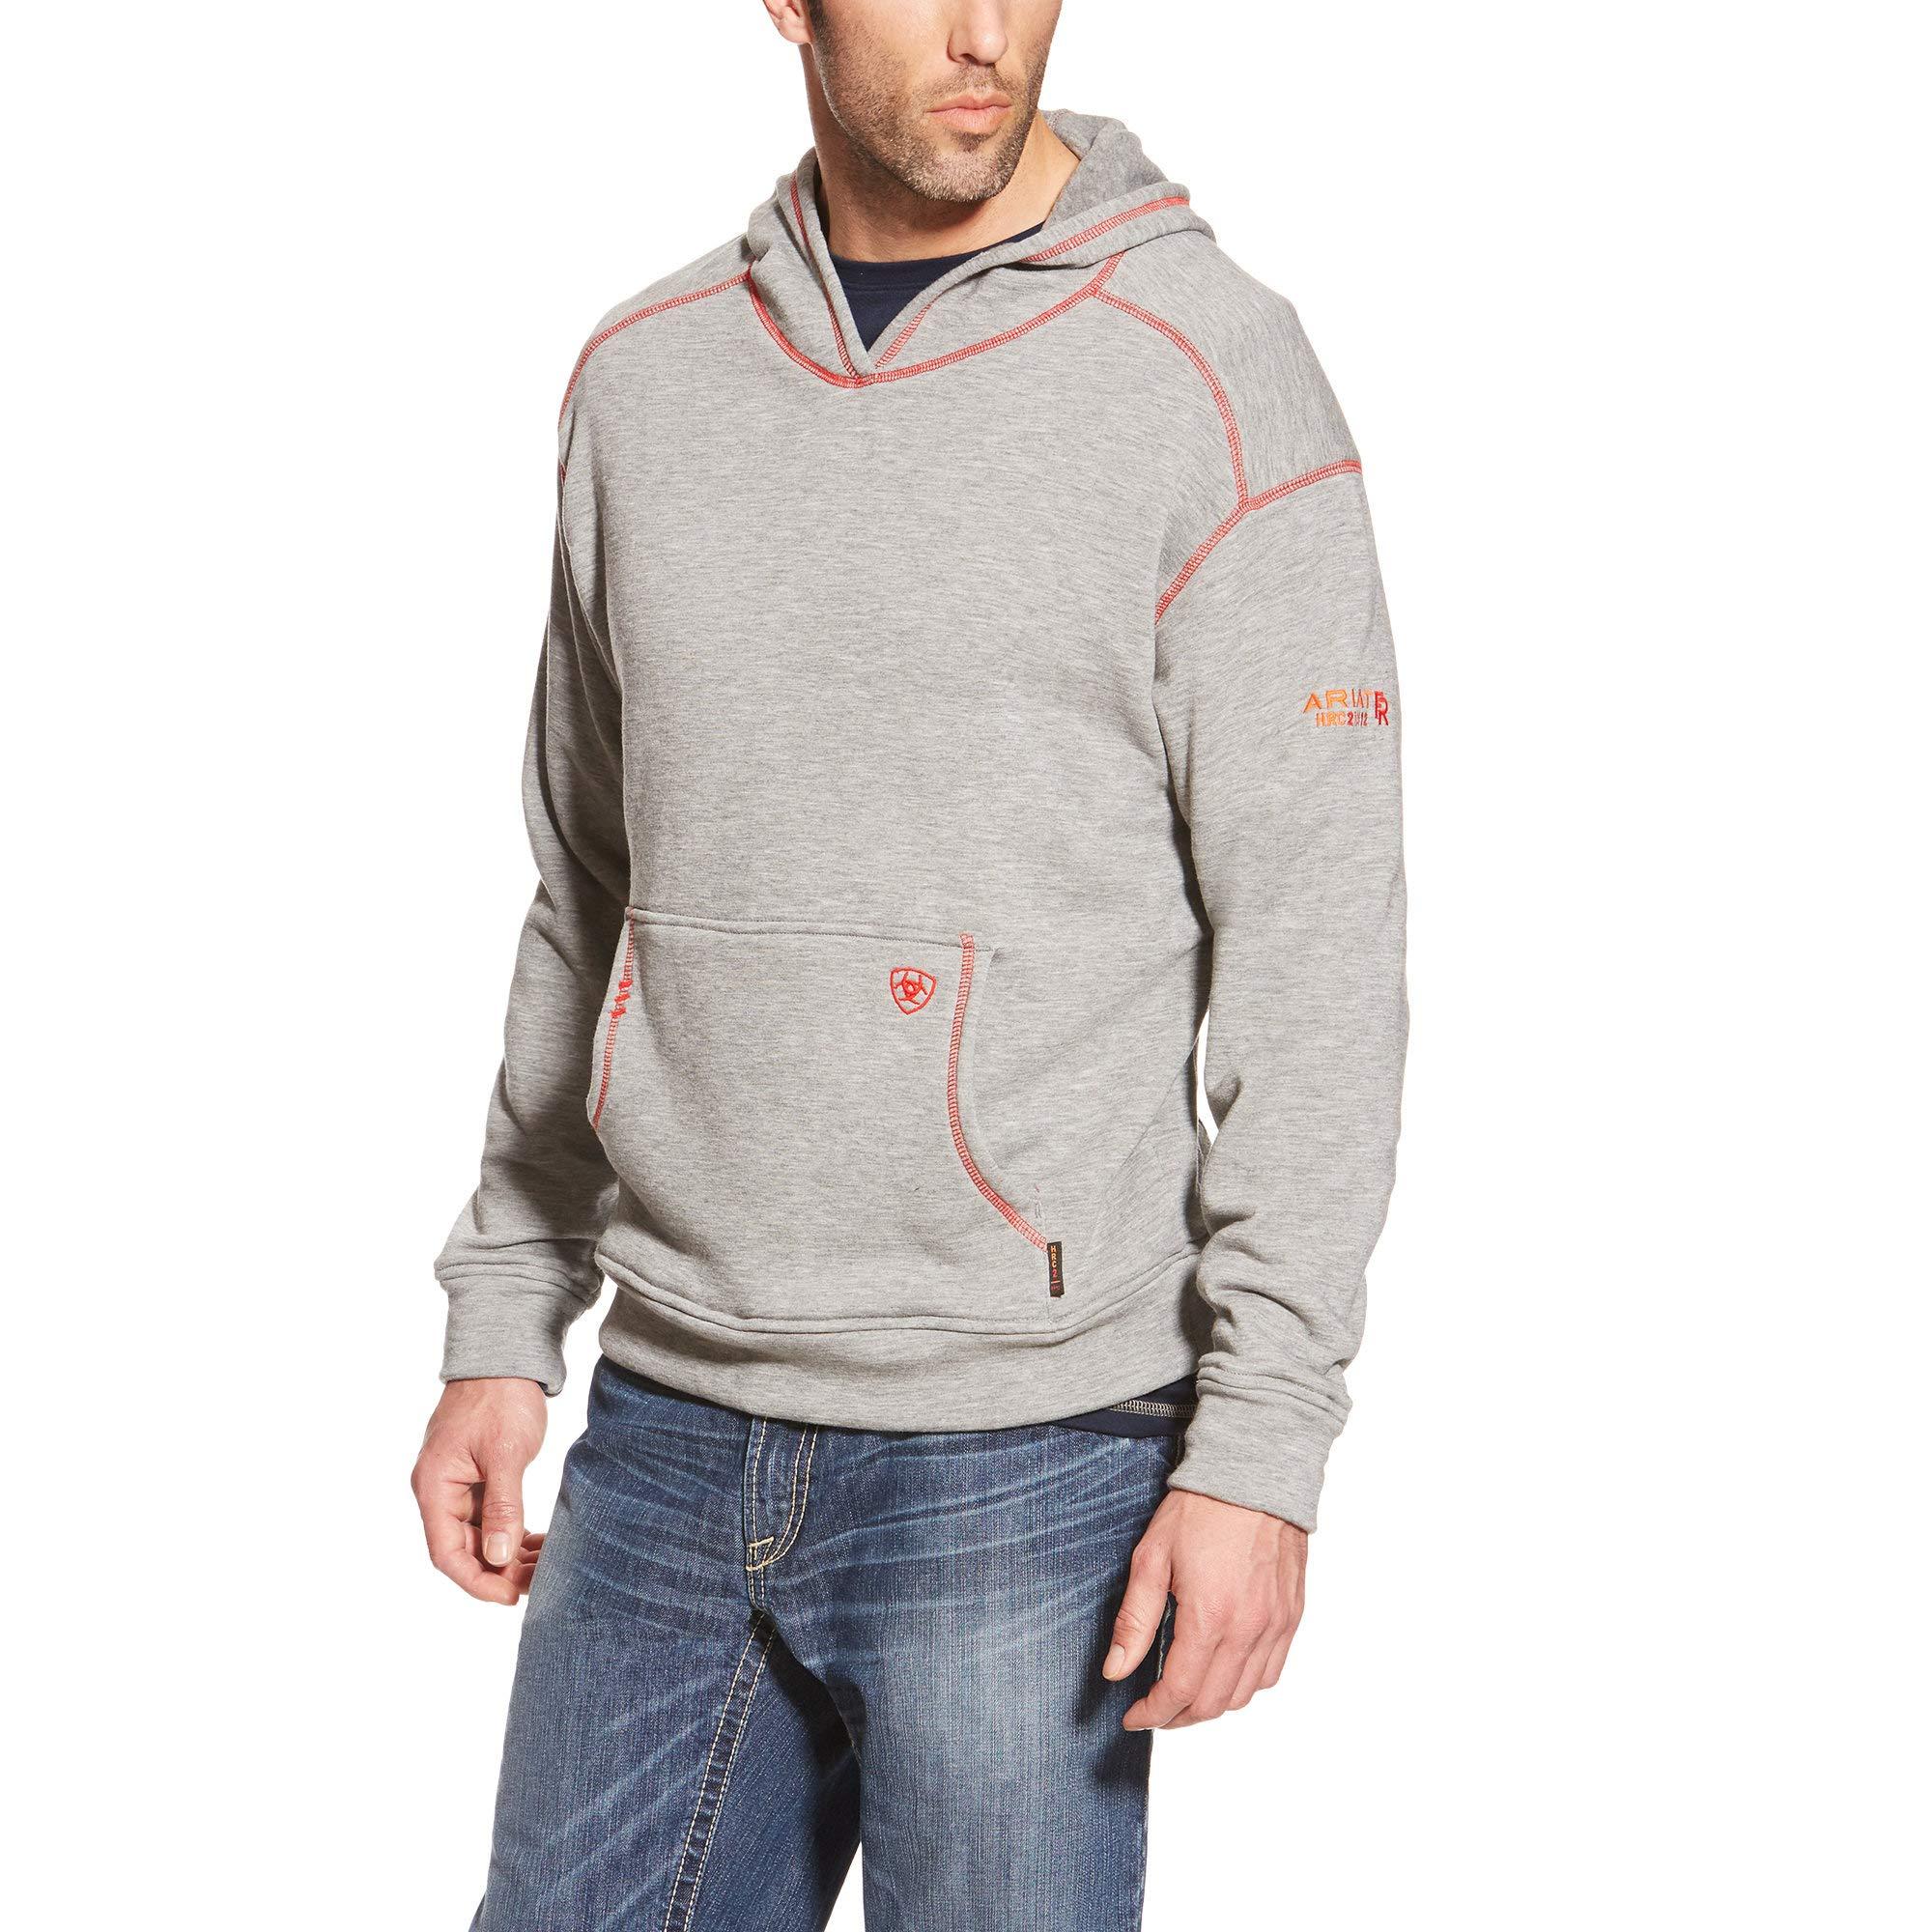 ARIAT Men's Flame Resistant Polartec Hoodie, Heather Gray, MD